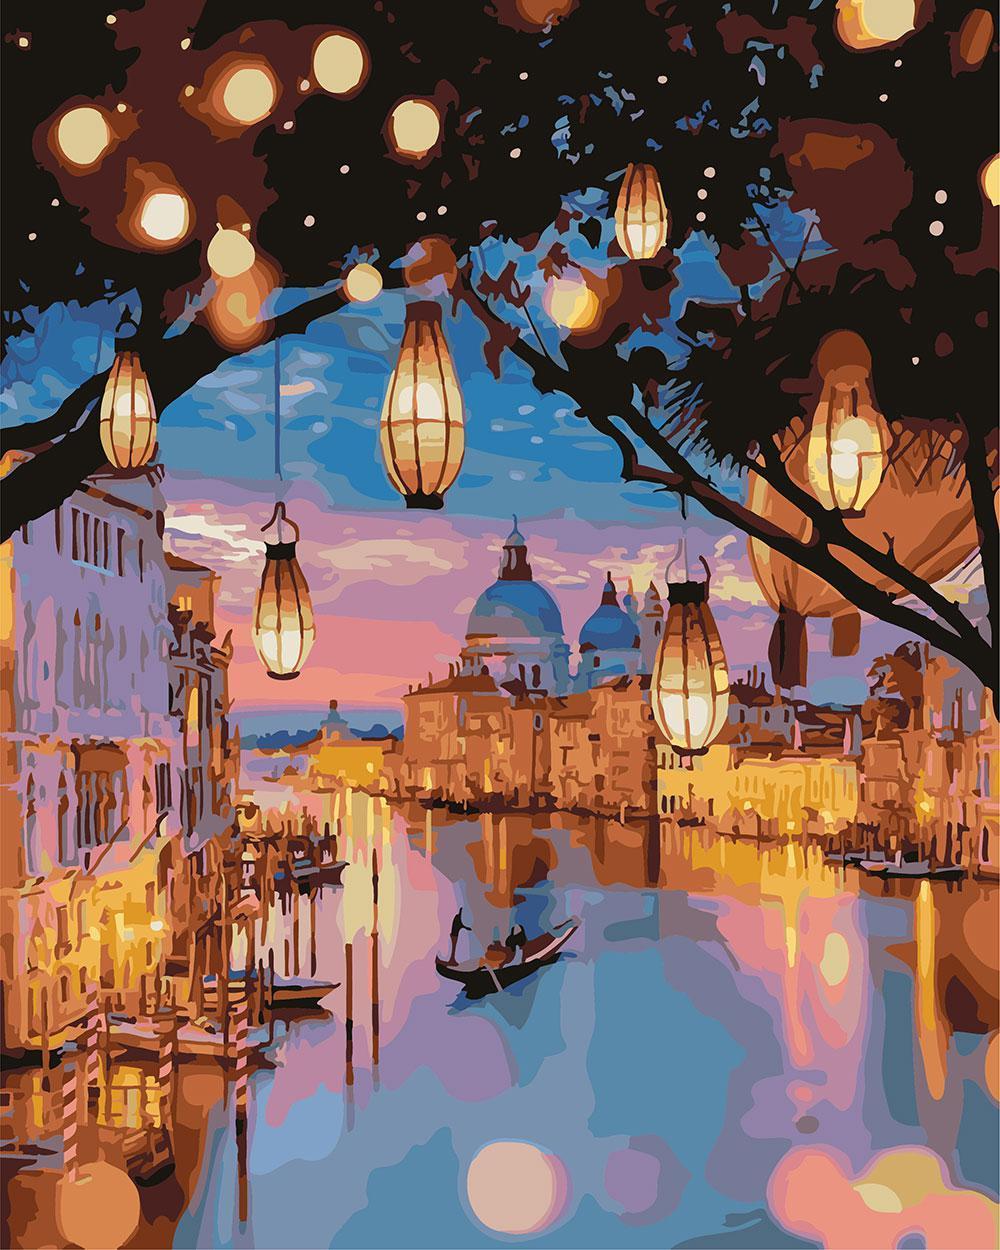 Картина по номерам Магия ночной Венеции 40 х 50 см (BK-GX24915)